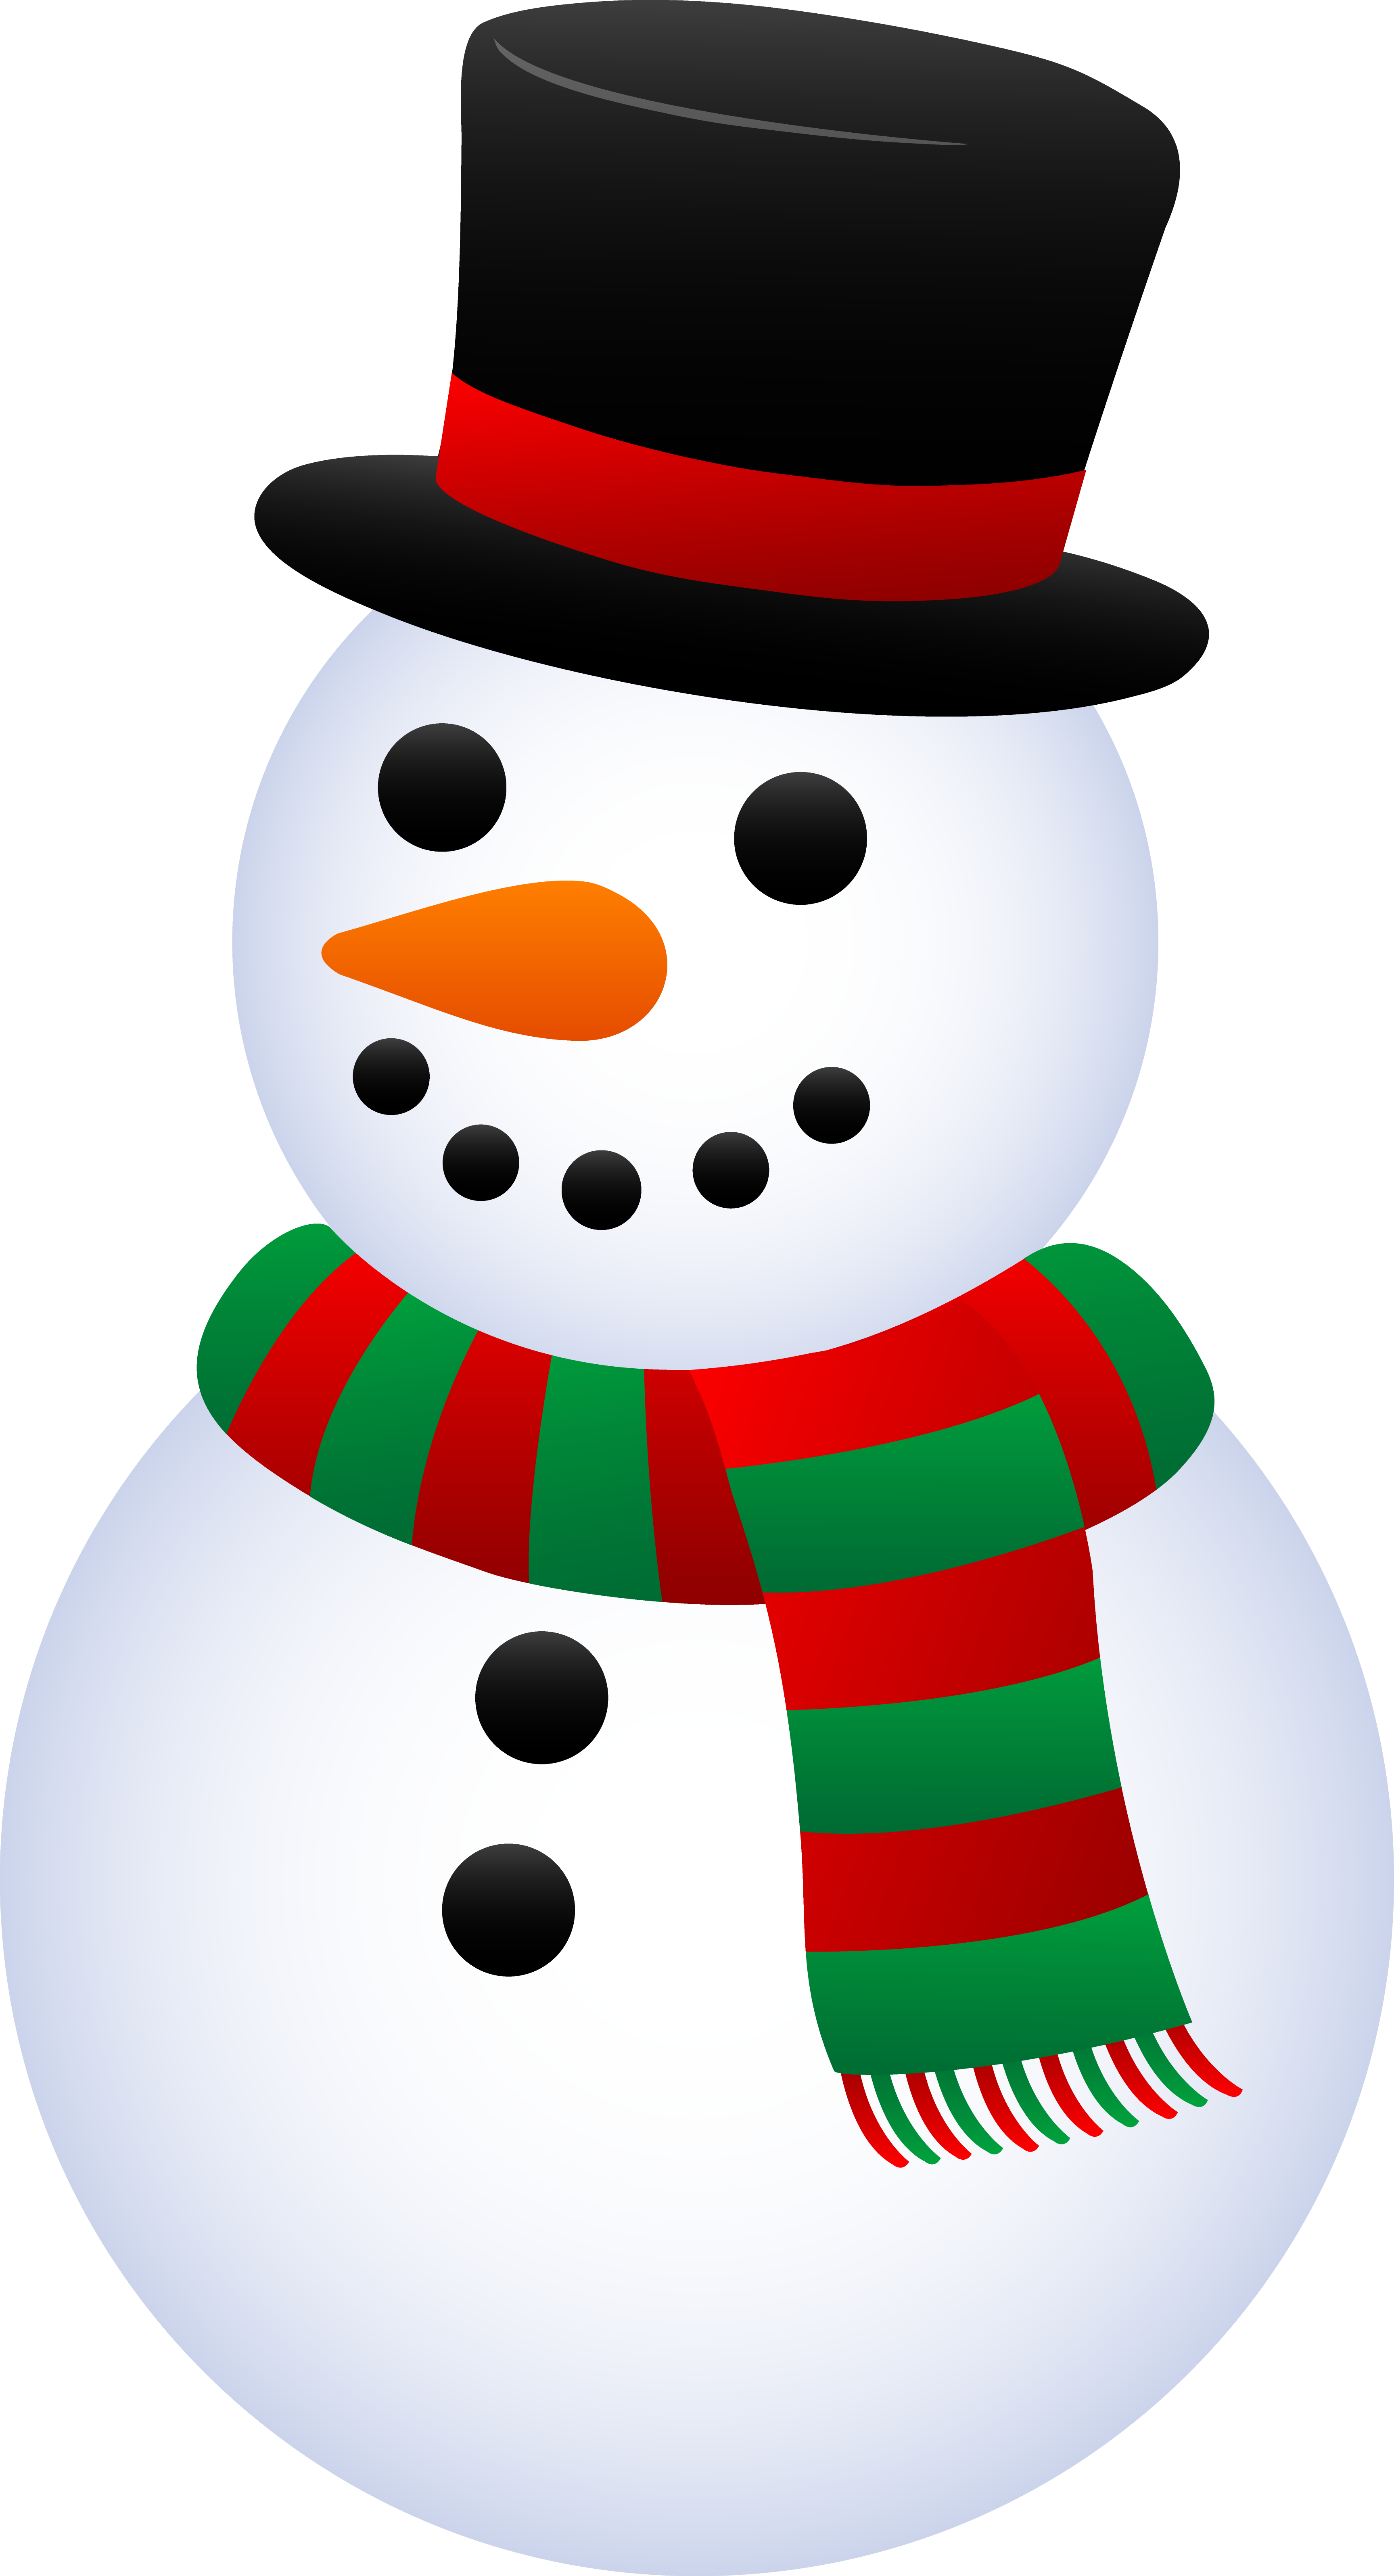 Snowman clipart. Top hat panda free